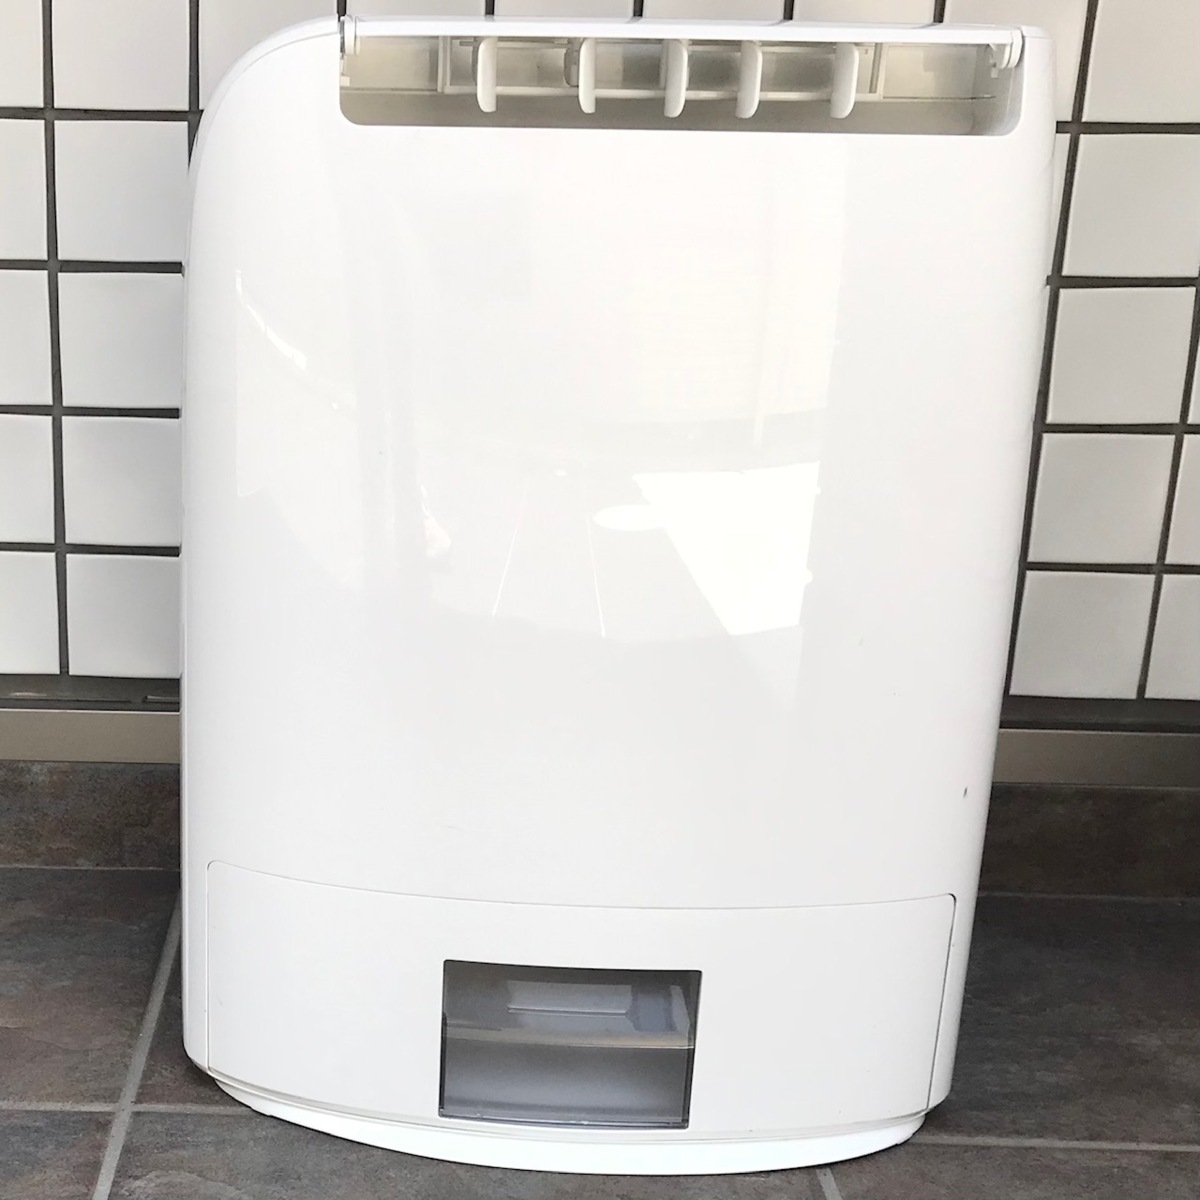 Panasonic パナソニック デシカント方式 衣類乾燥除湿機 F-YZM60 ホワイト 2016年製 中古品 動作確認済 140サイズ発送予定_画像2